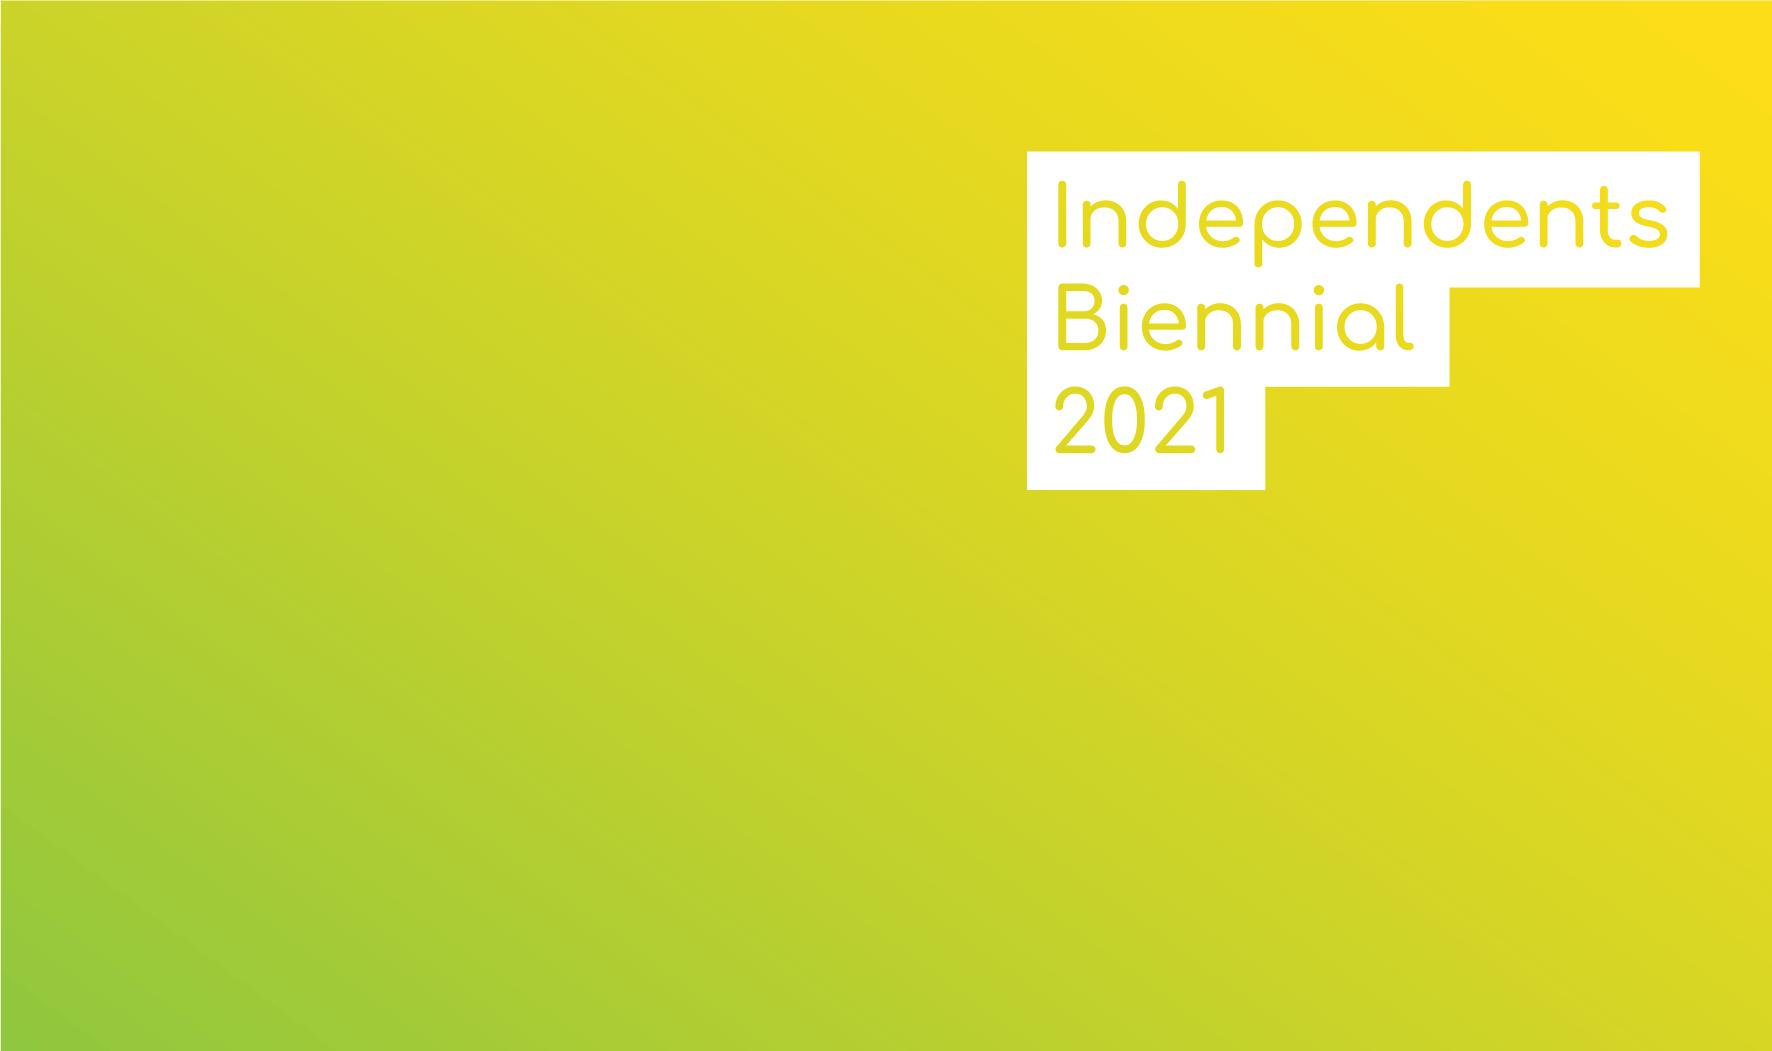 Independents Biennial 2021